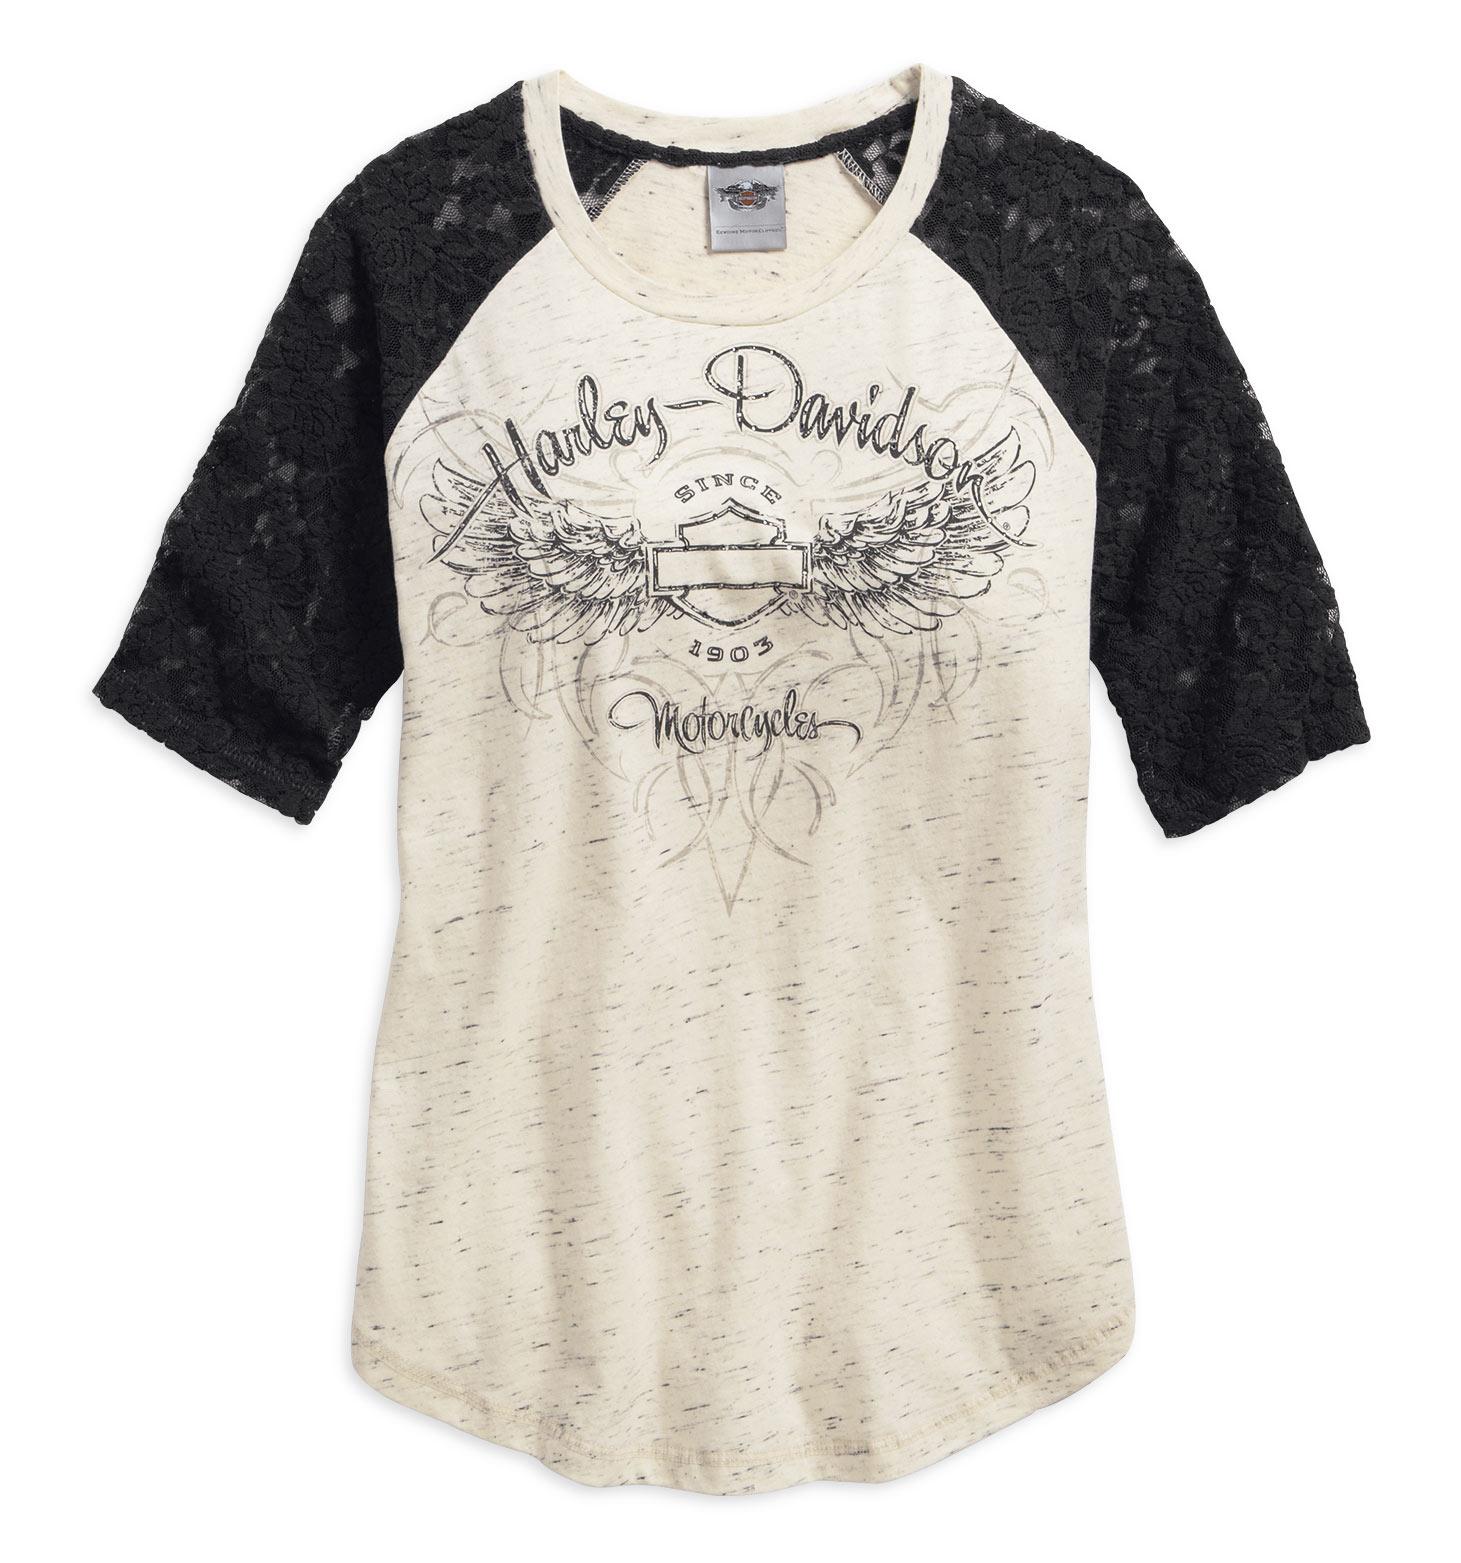 99152 16vw harley davidson damen t shirt lace accent schwarz weiss im thunderbike shop. Black Bedroom Furniture Sets. Home Design Ideas